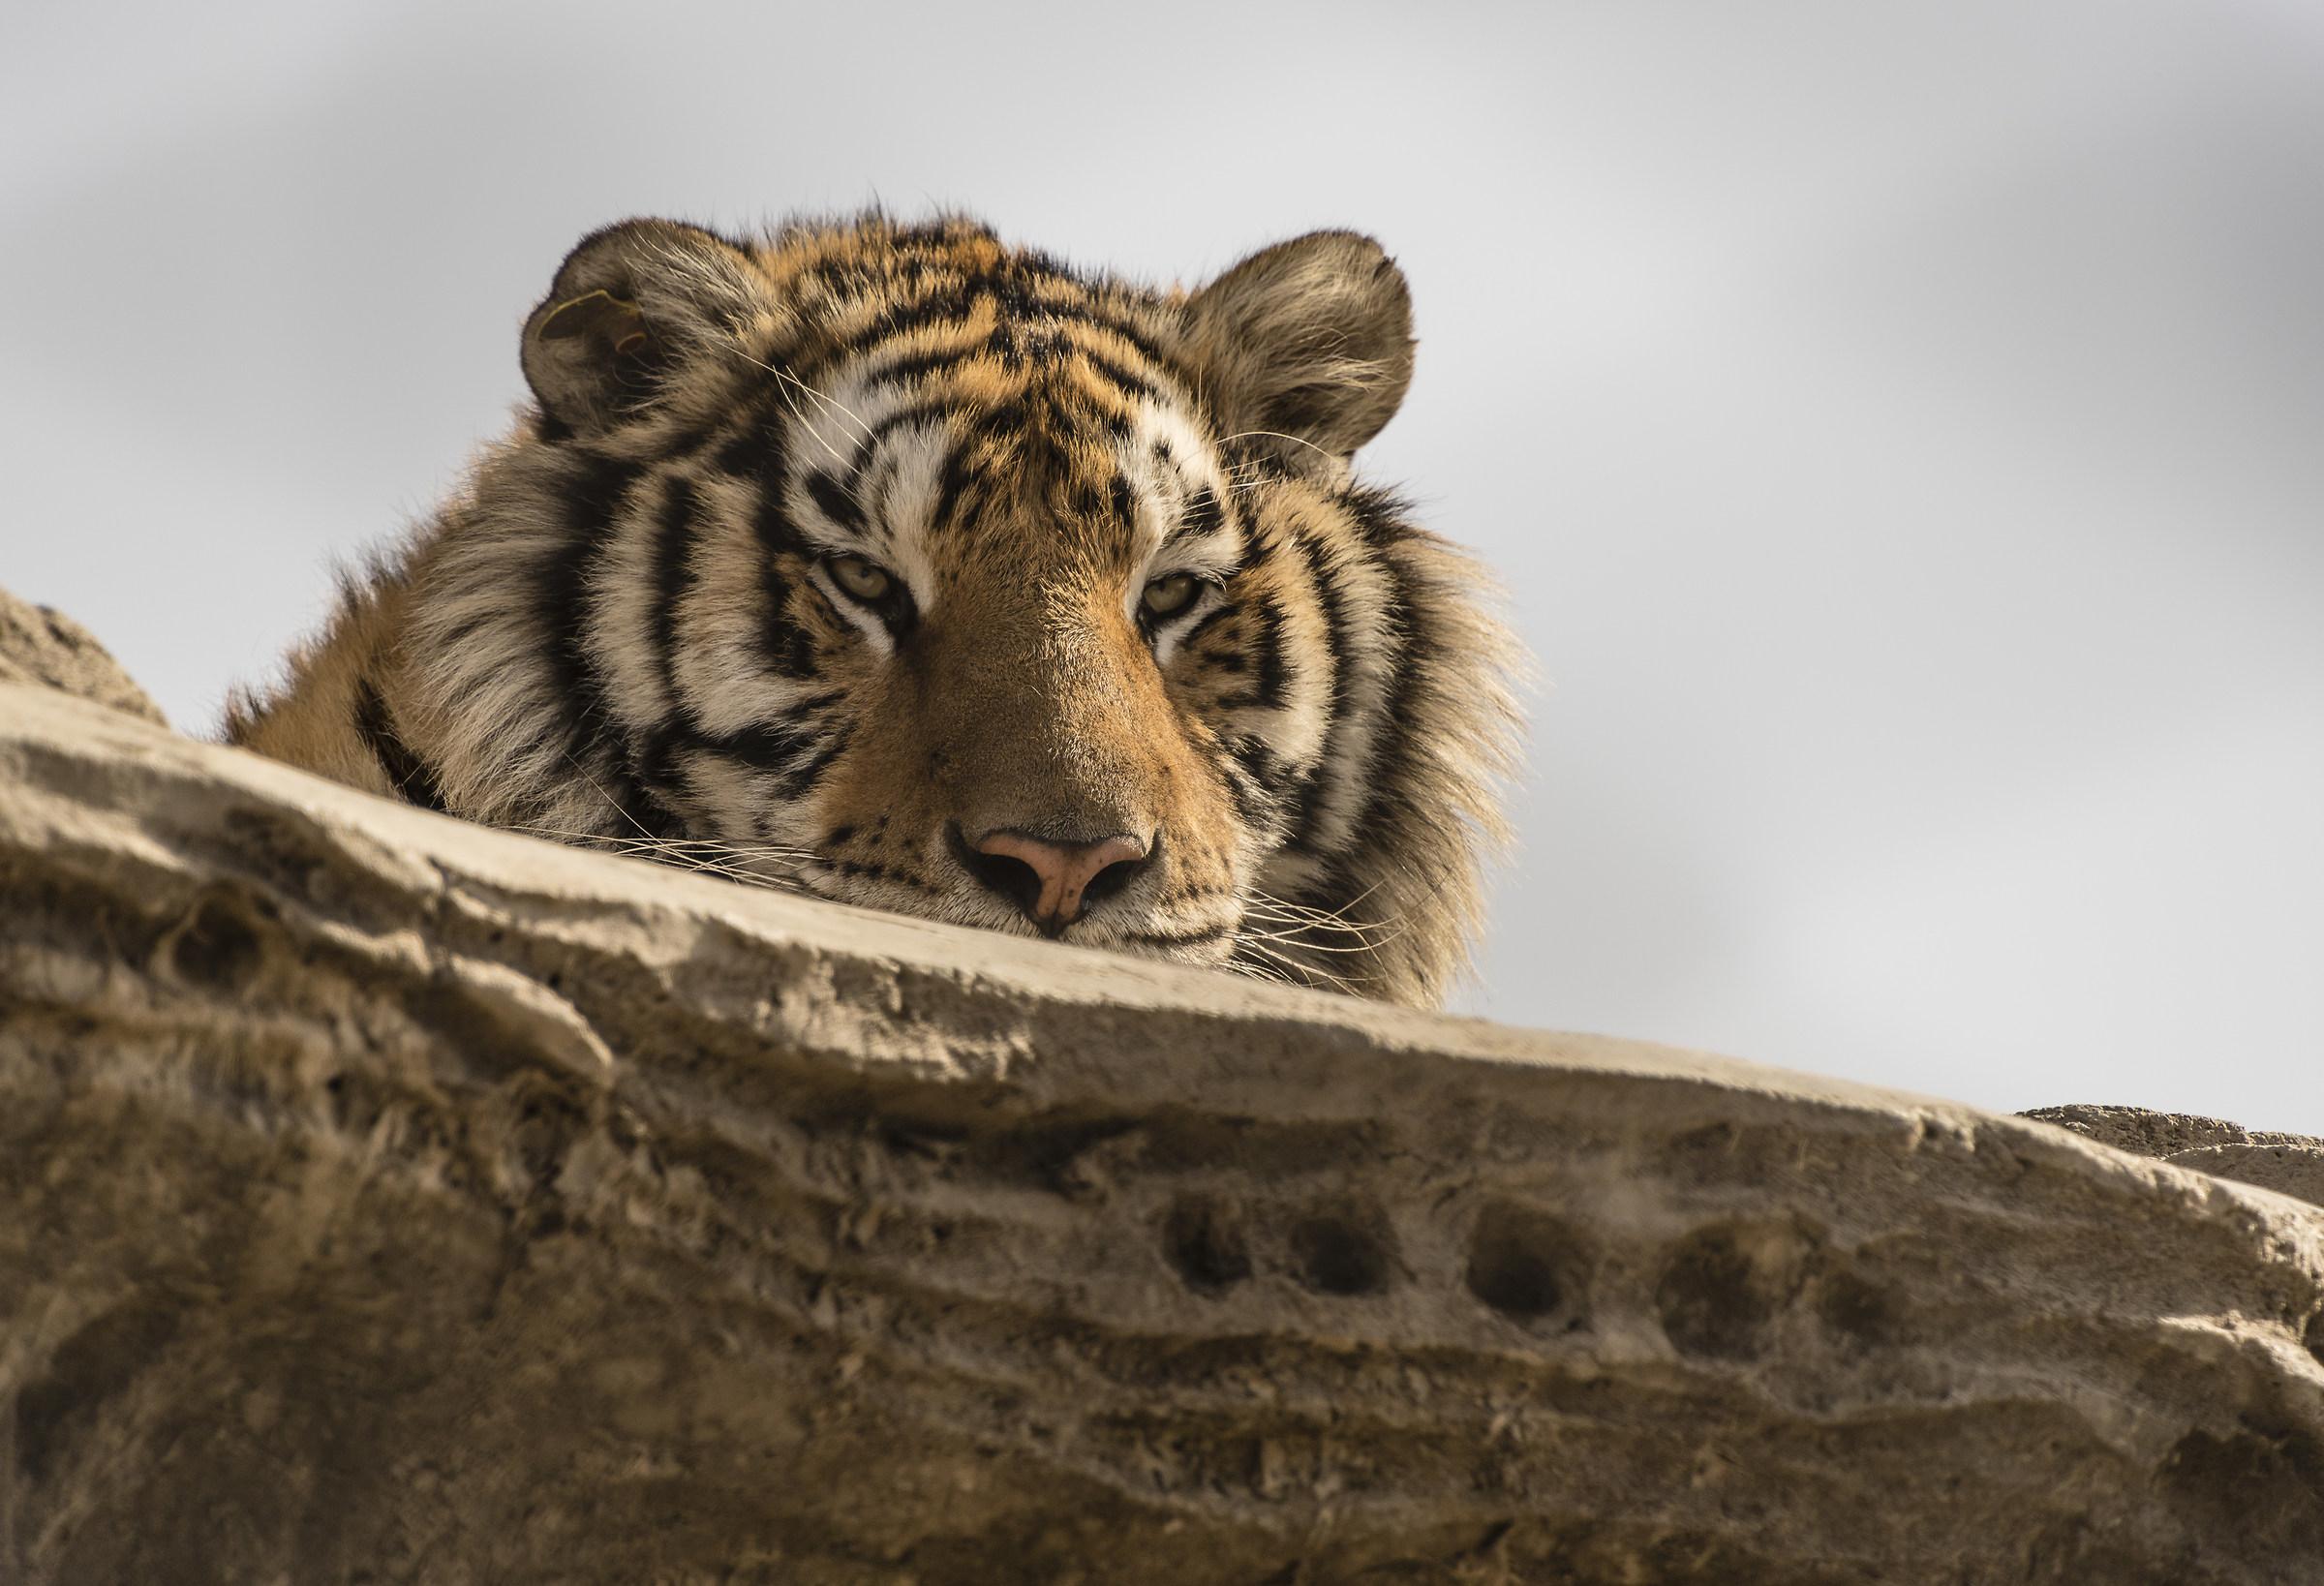 Siberia tiger park - Harbin, Cina...